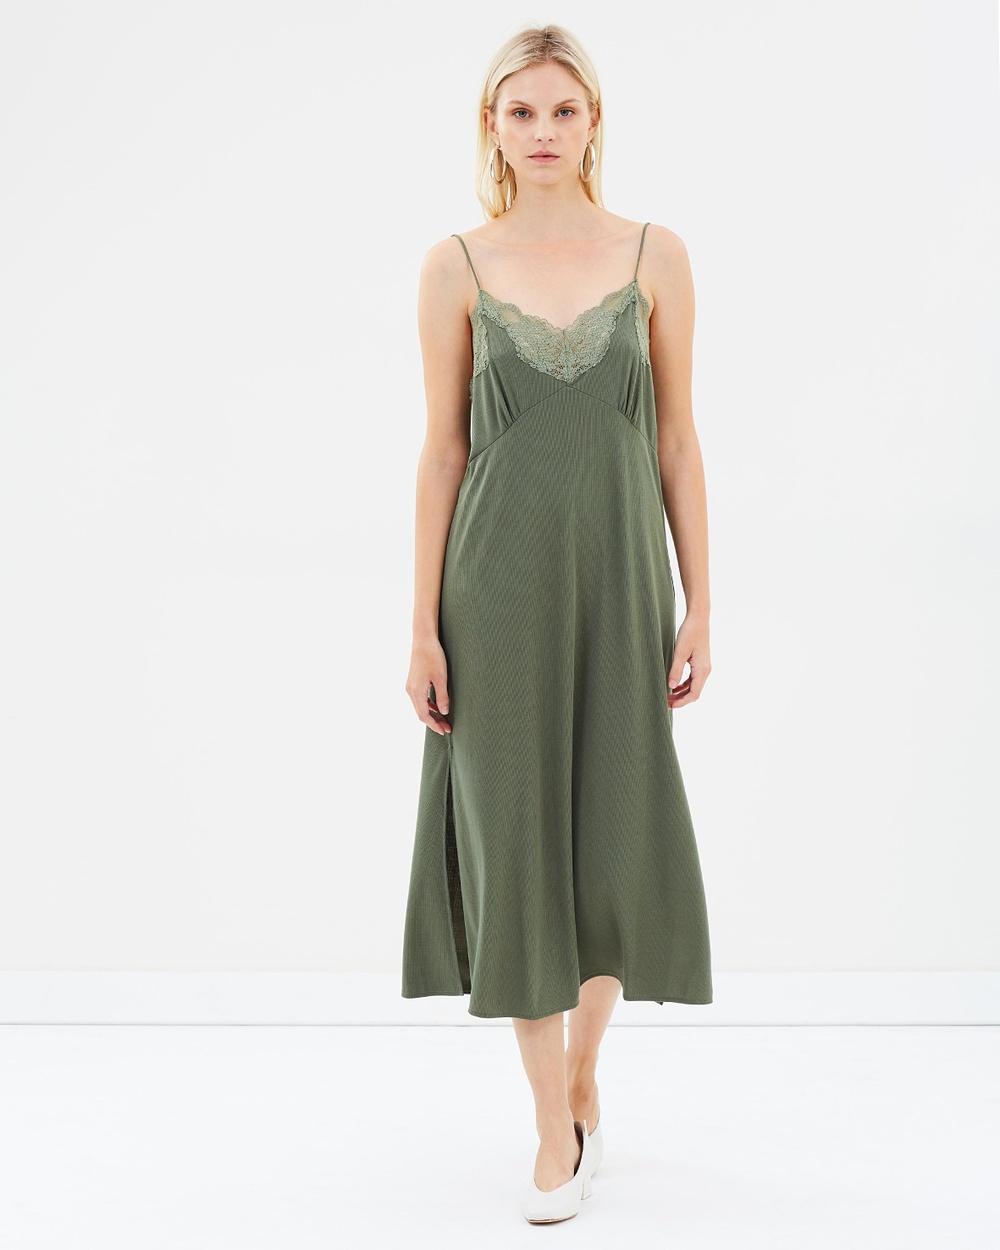 M.N.G Lency Dress Dresses Green Lency Dress